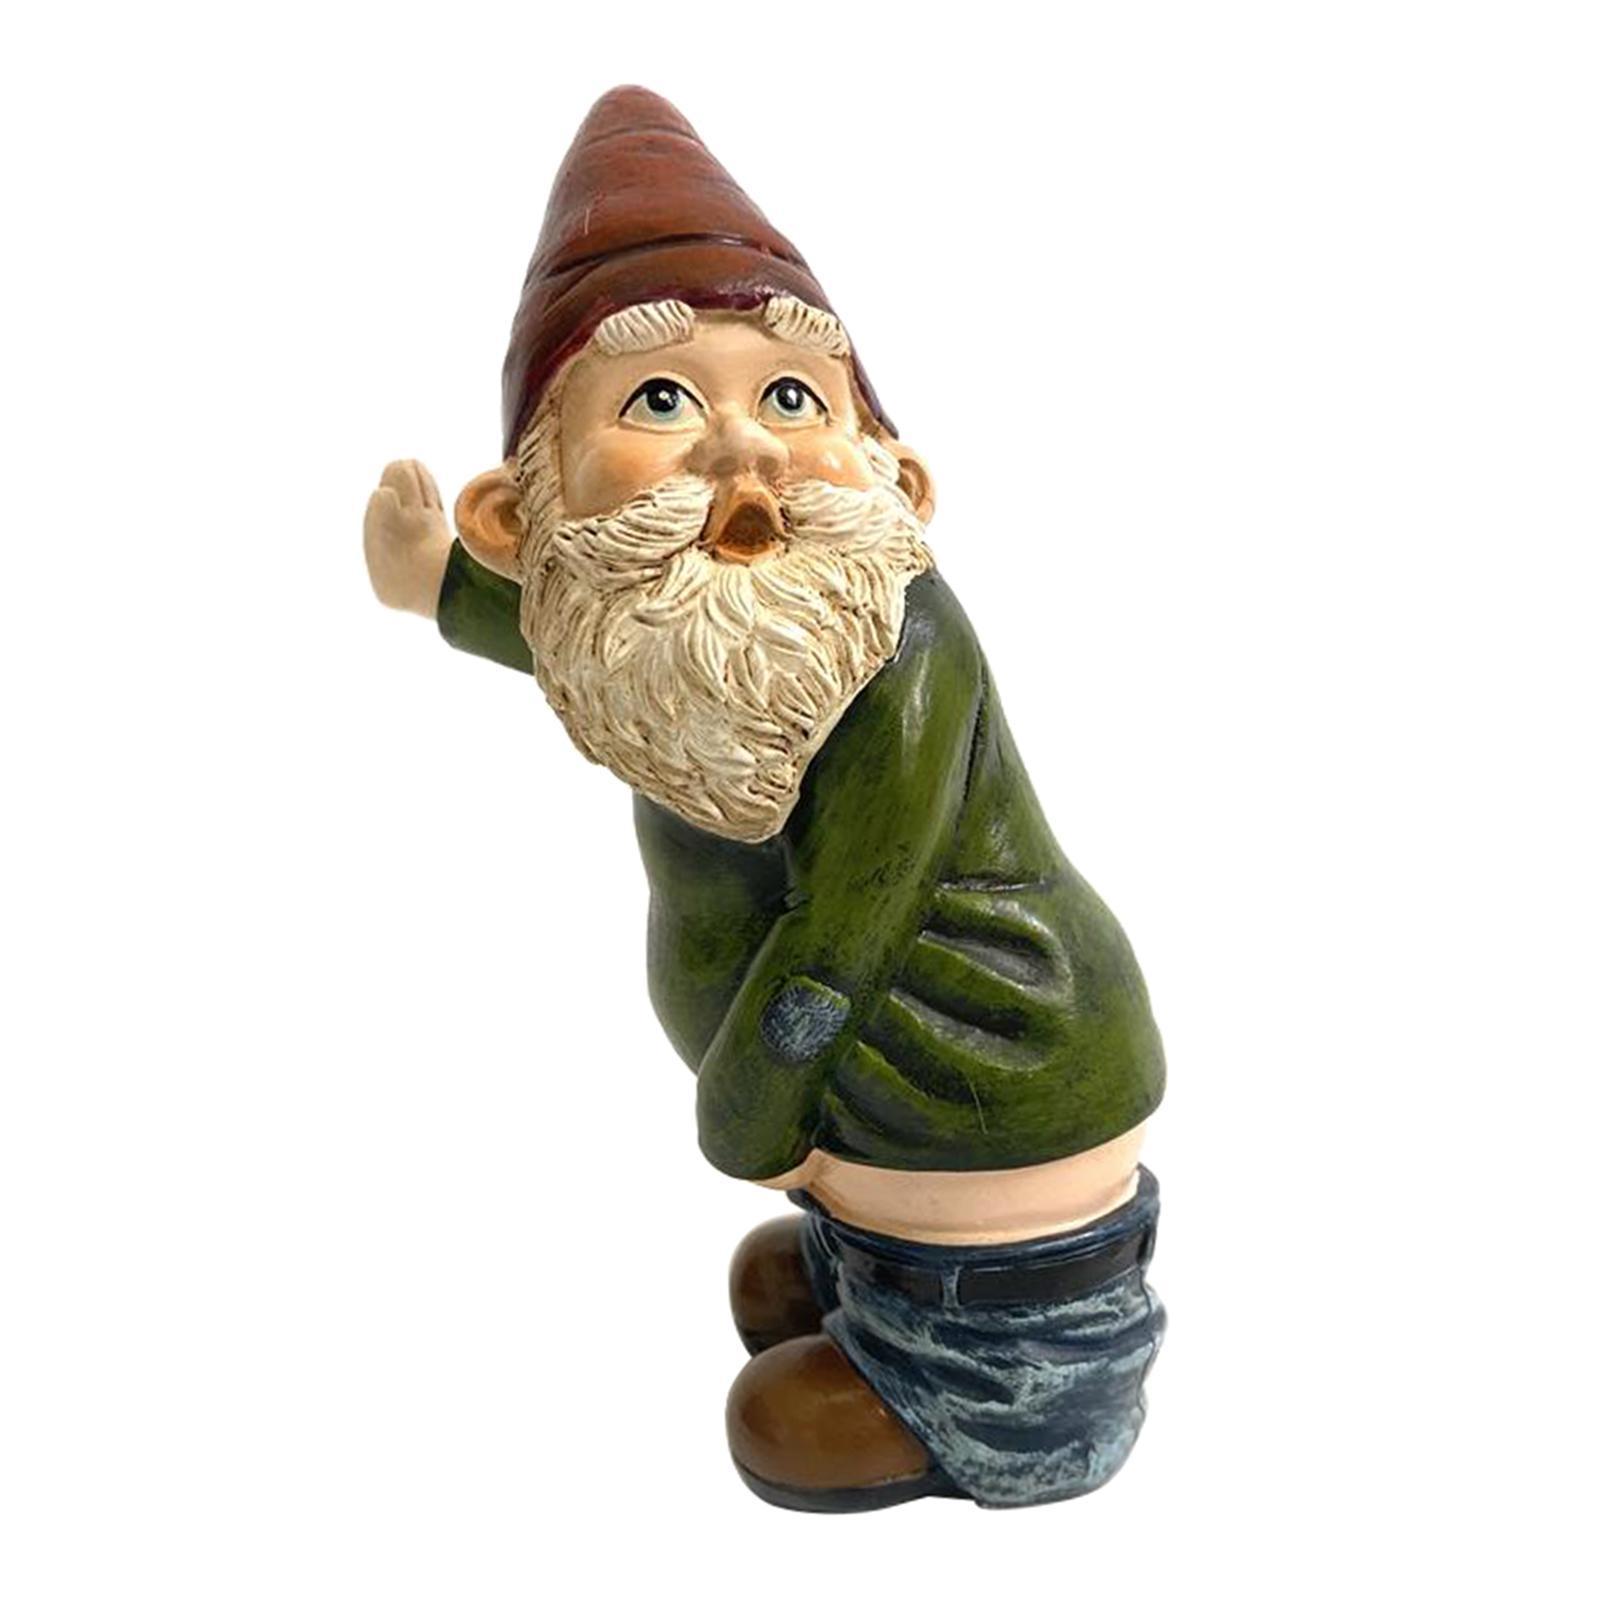 thumbnail 4 - Funny Resin Naughty Garden Gnome Statue Ornaments Outdoor Villa Home Figurines